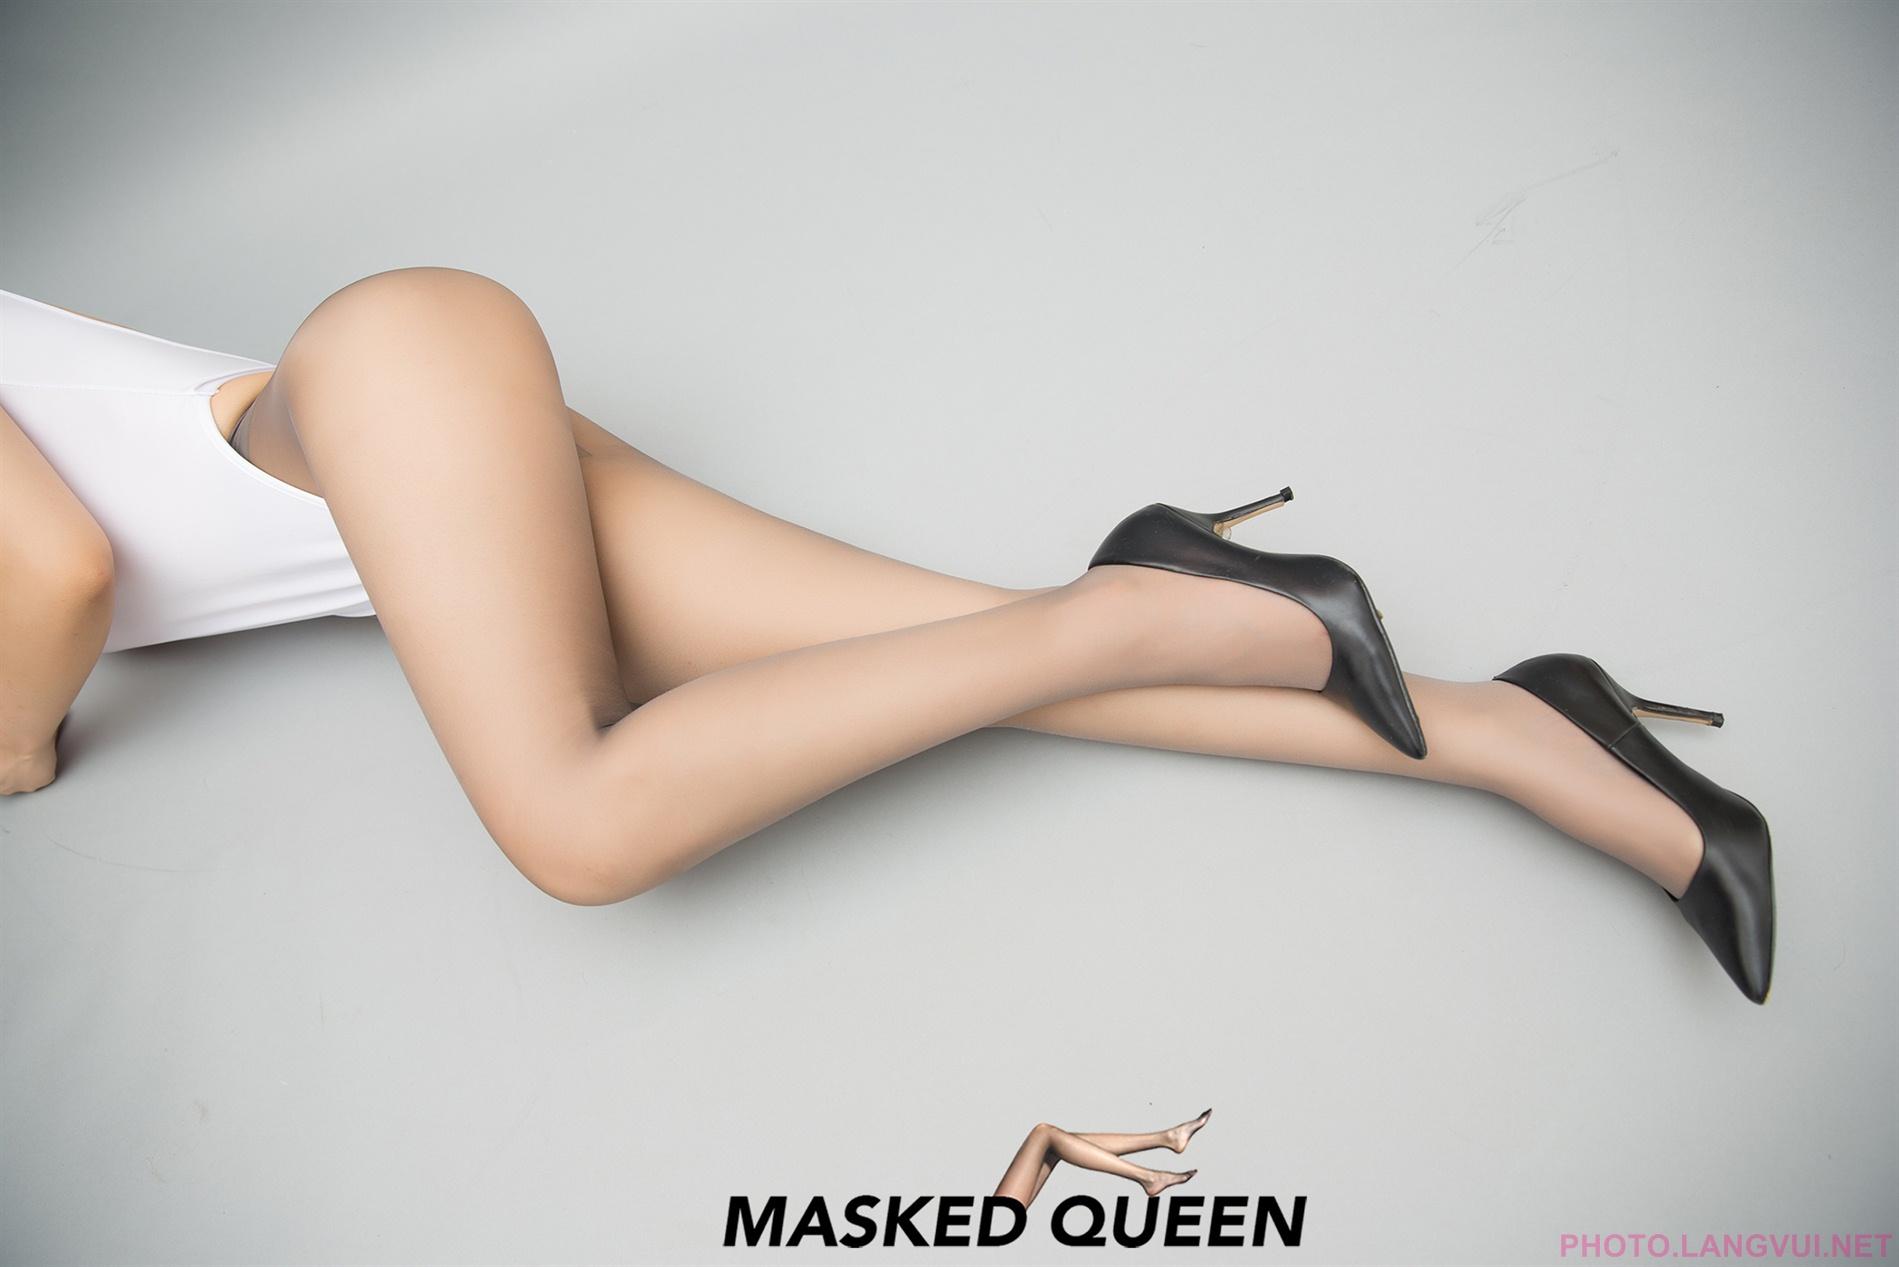 MASKED QUEEN No 023